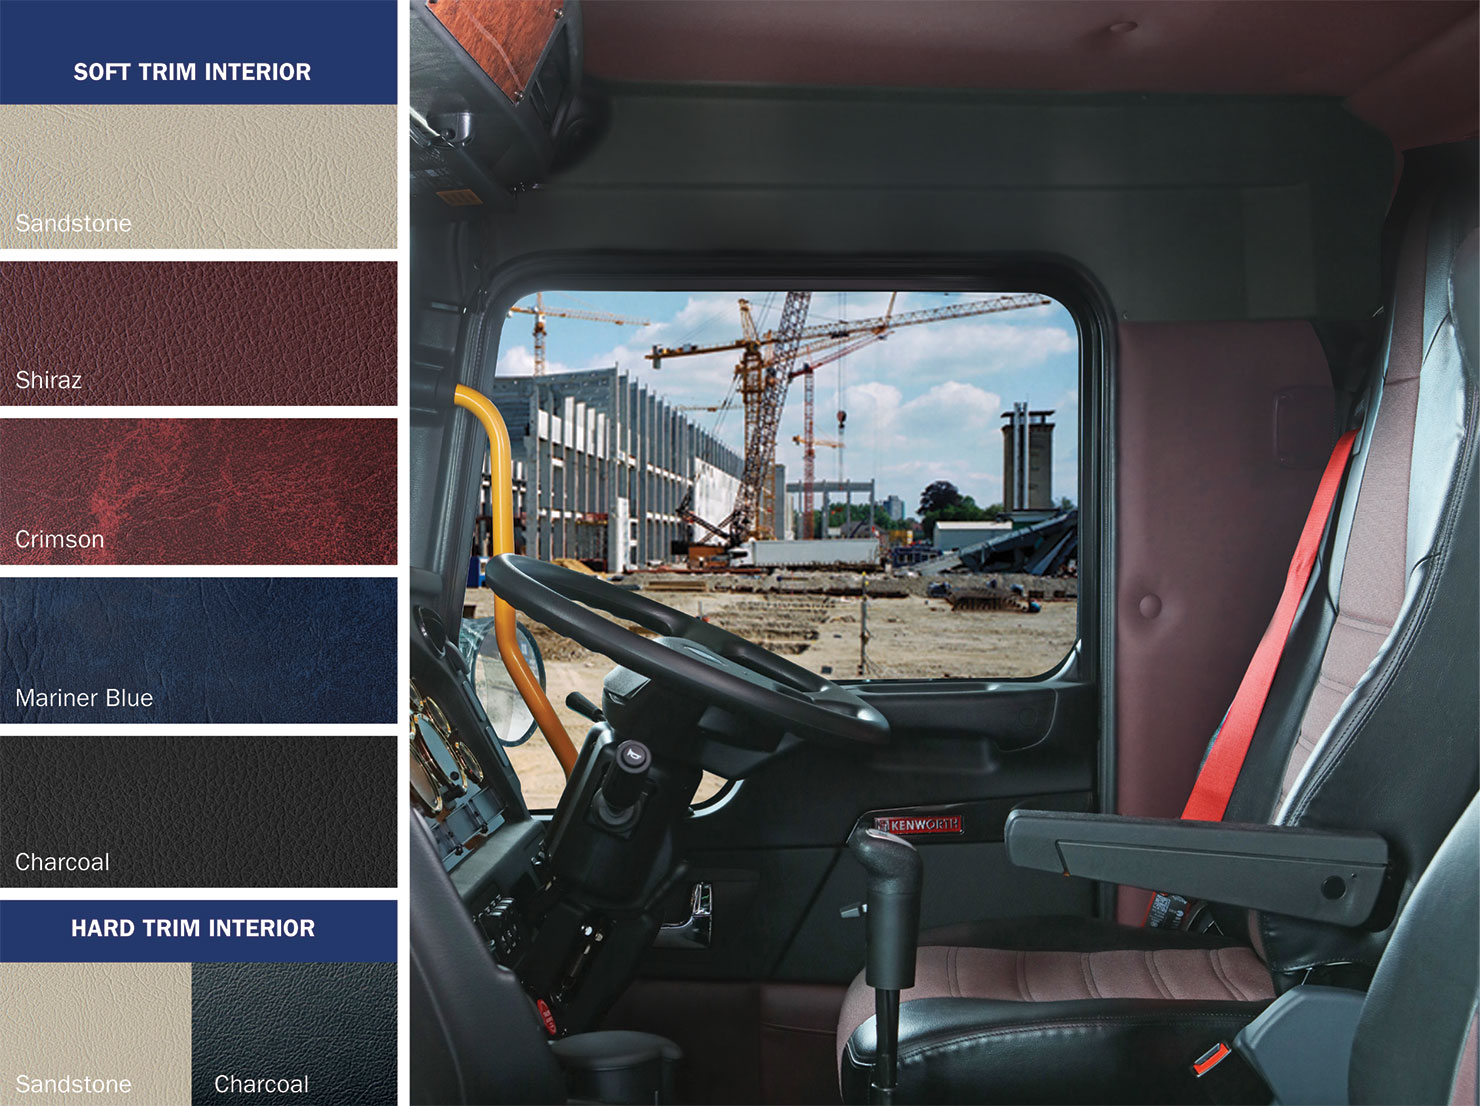 T359 Kenworth Australia T300 Fuse Box Location On Sandstone Shiraz Charcoal Crimson Mariner Blue